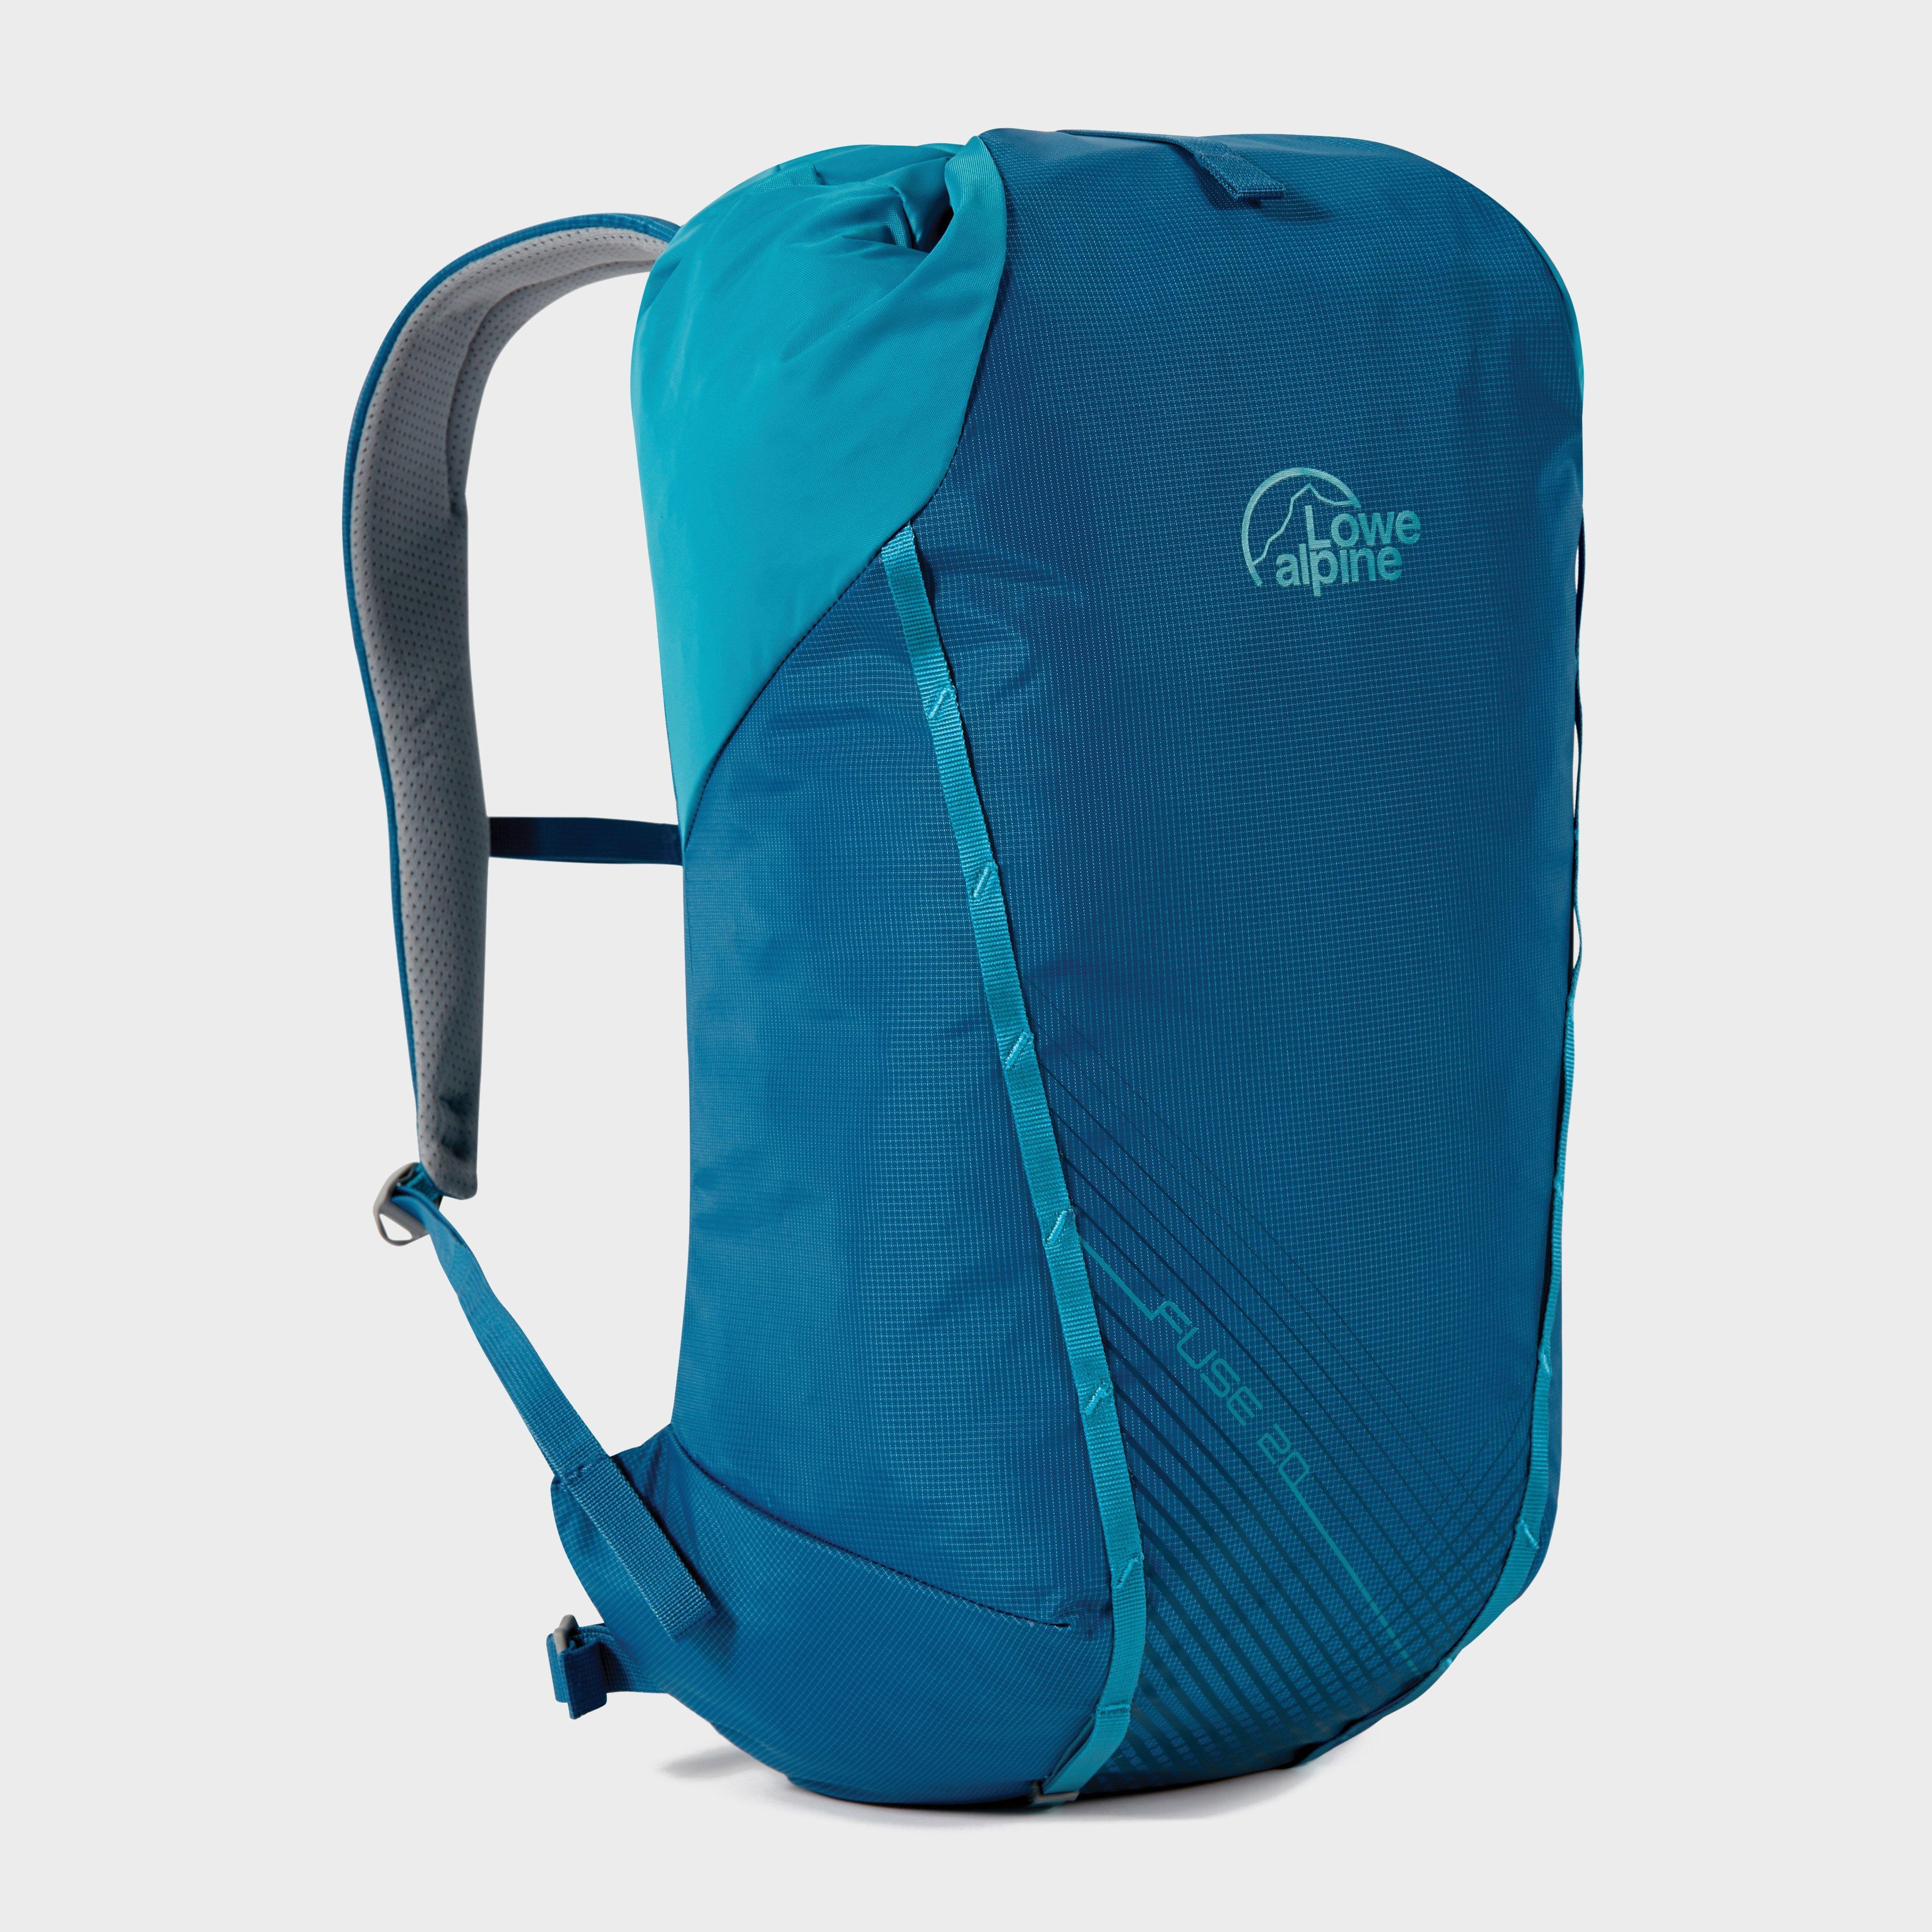 Lowe Alpine Fuse 20 Daypack